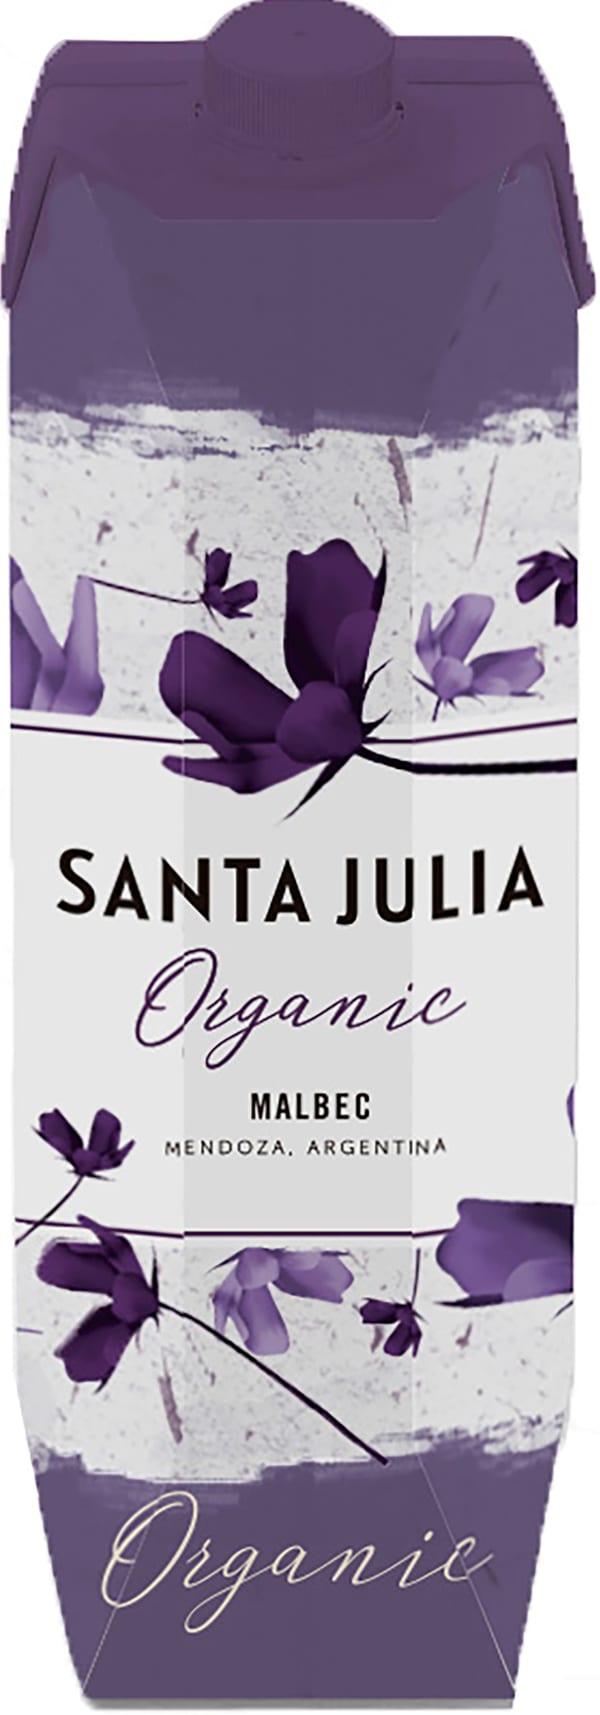 Santa Julia Organic Malbec 2019 carton package